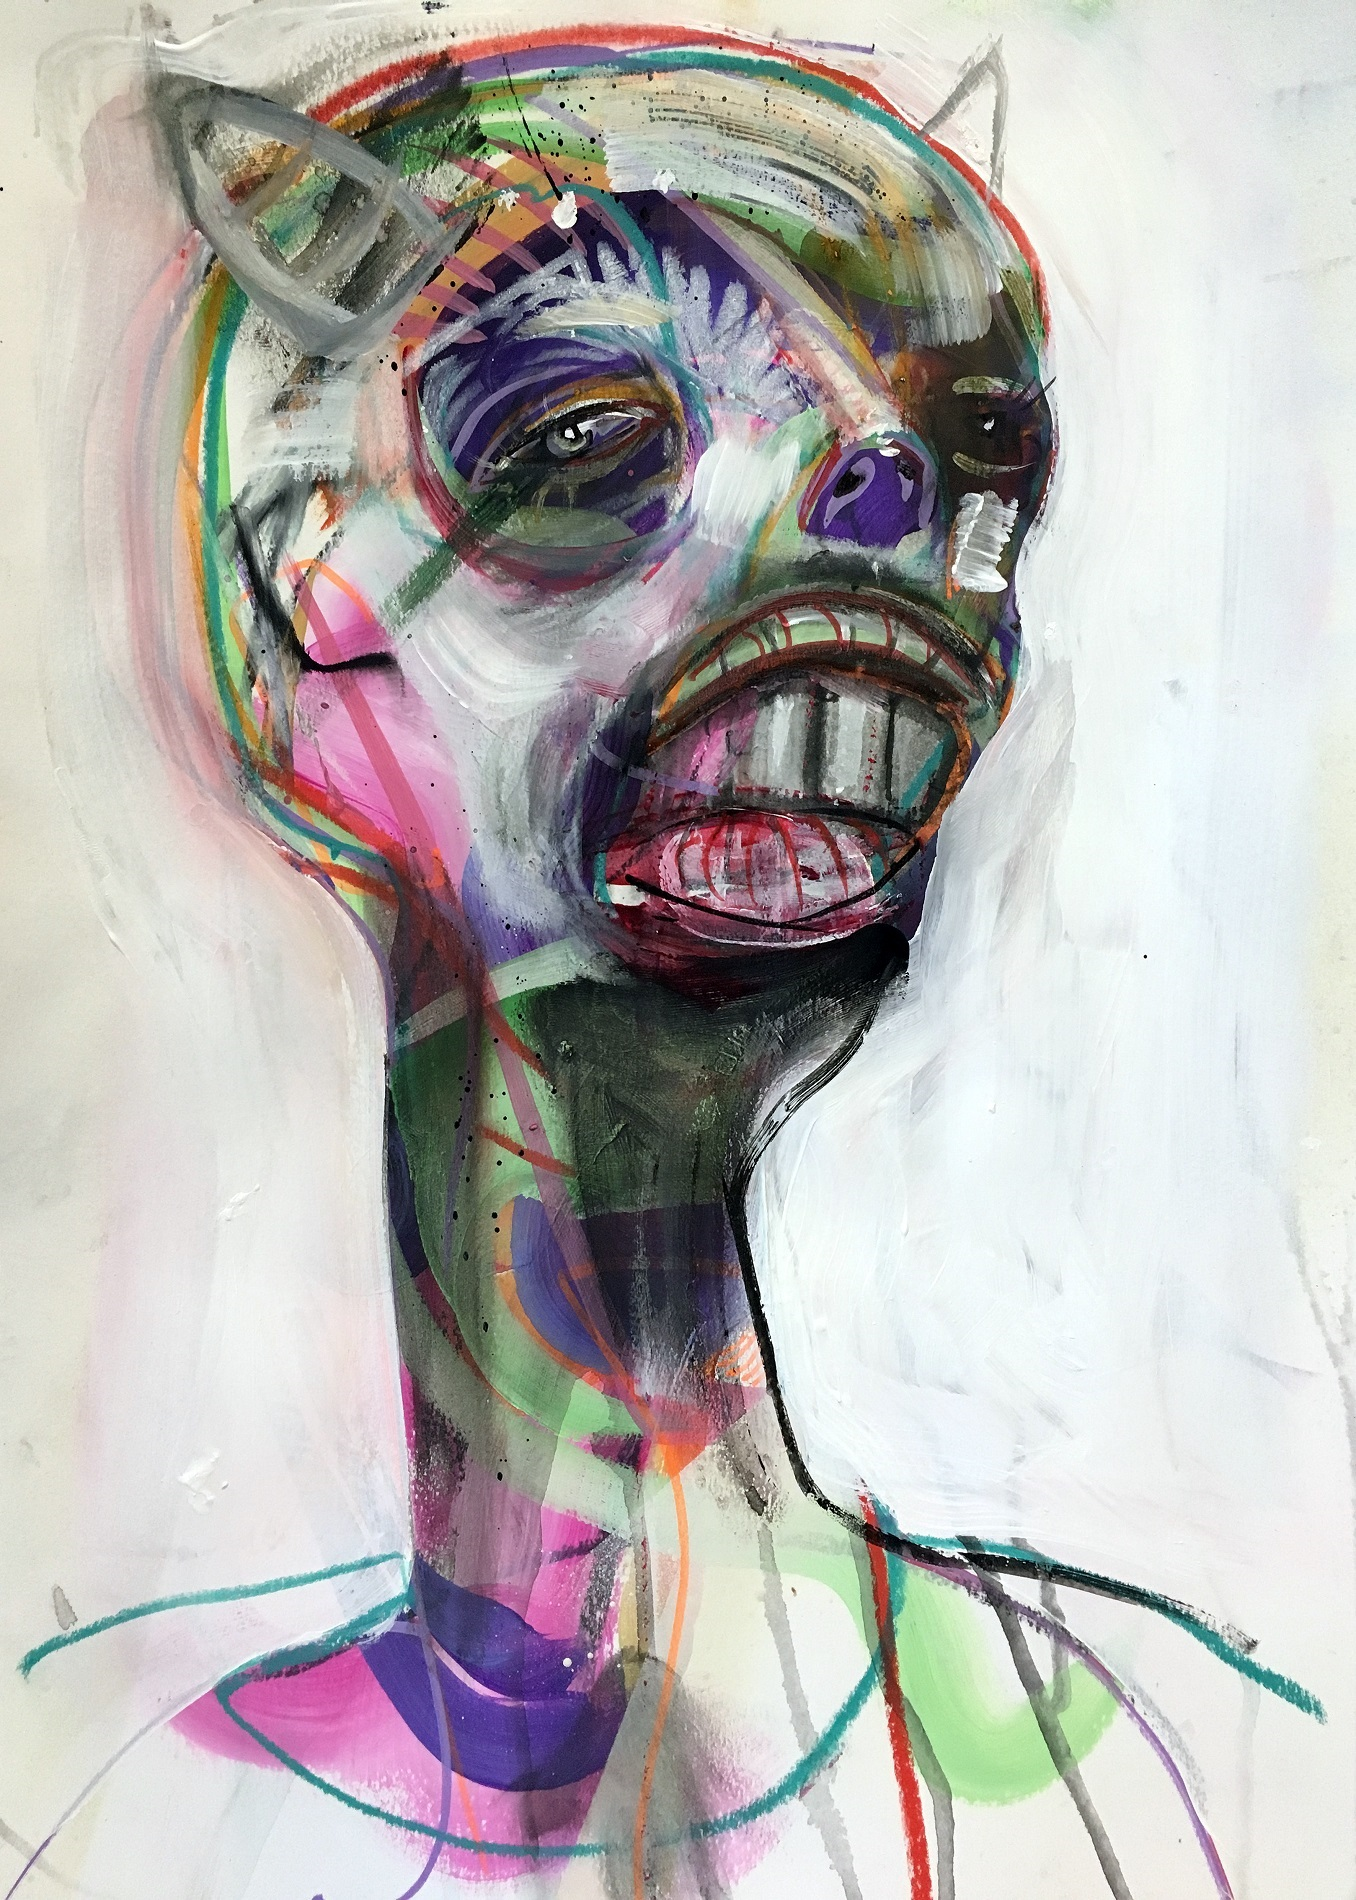 Modern Art Depicting Illness